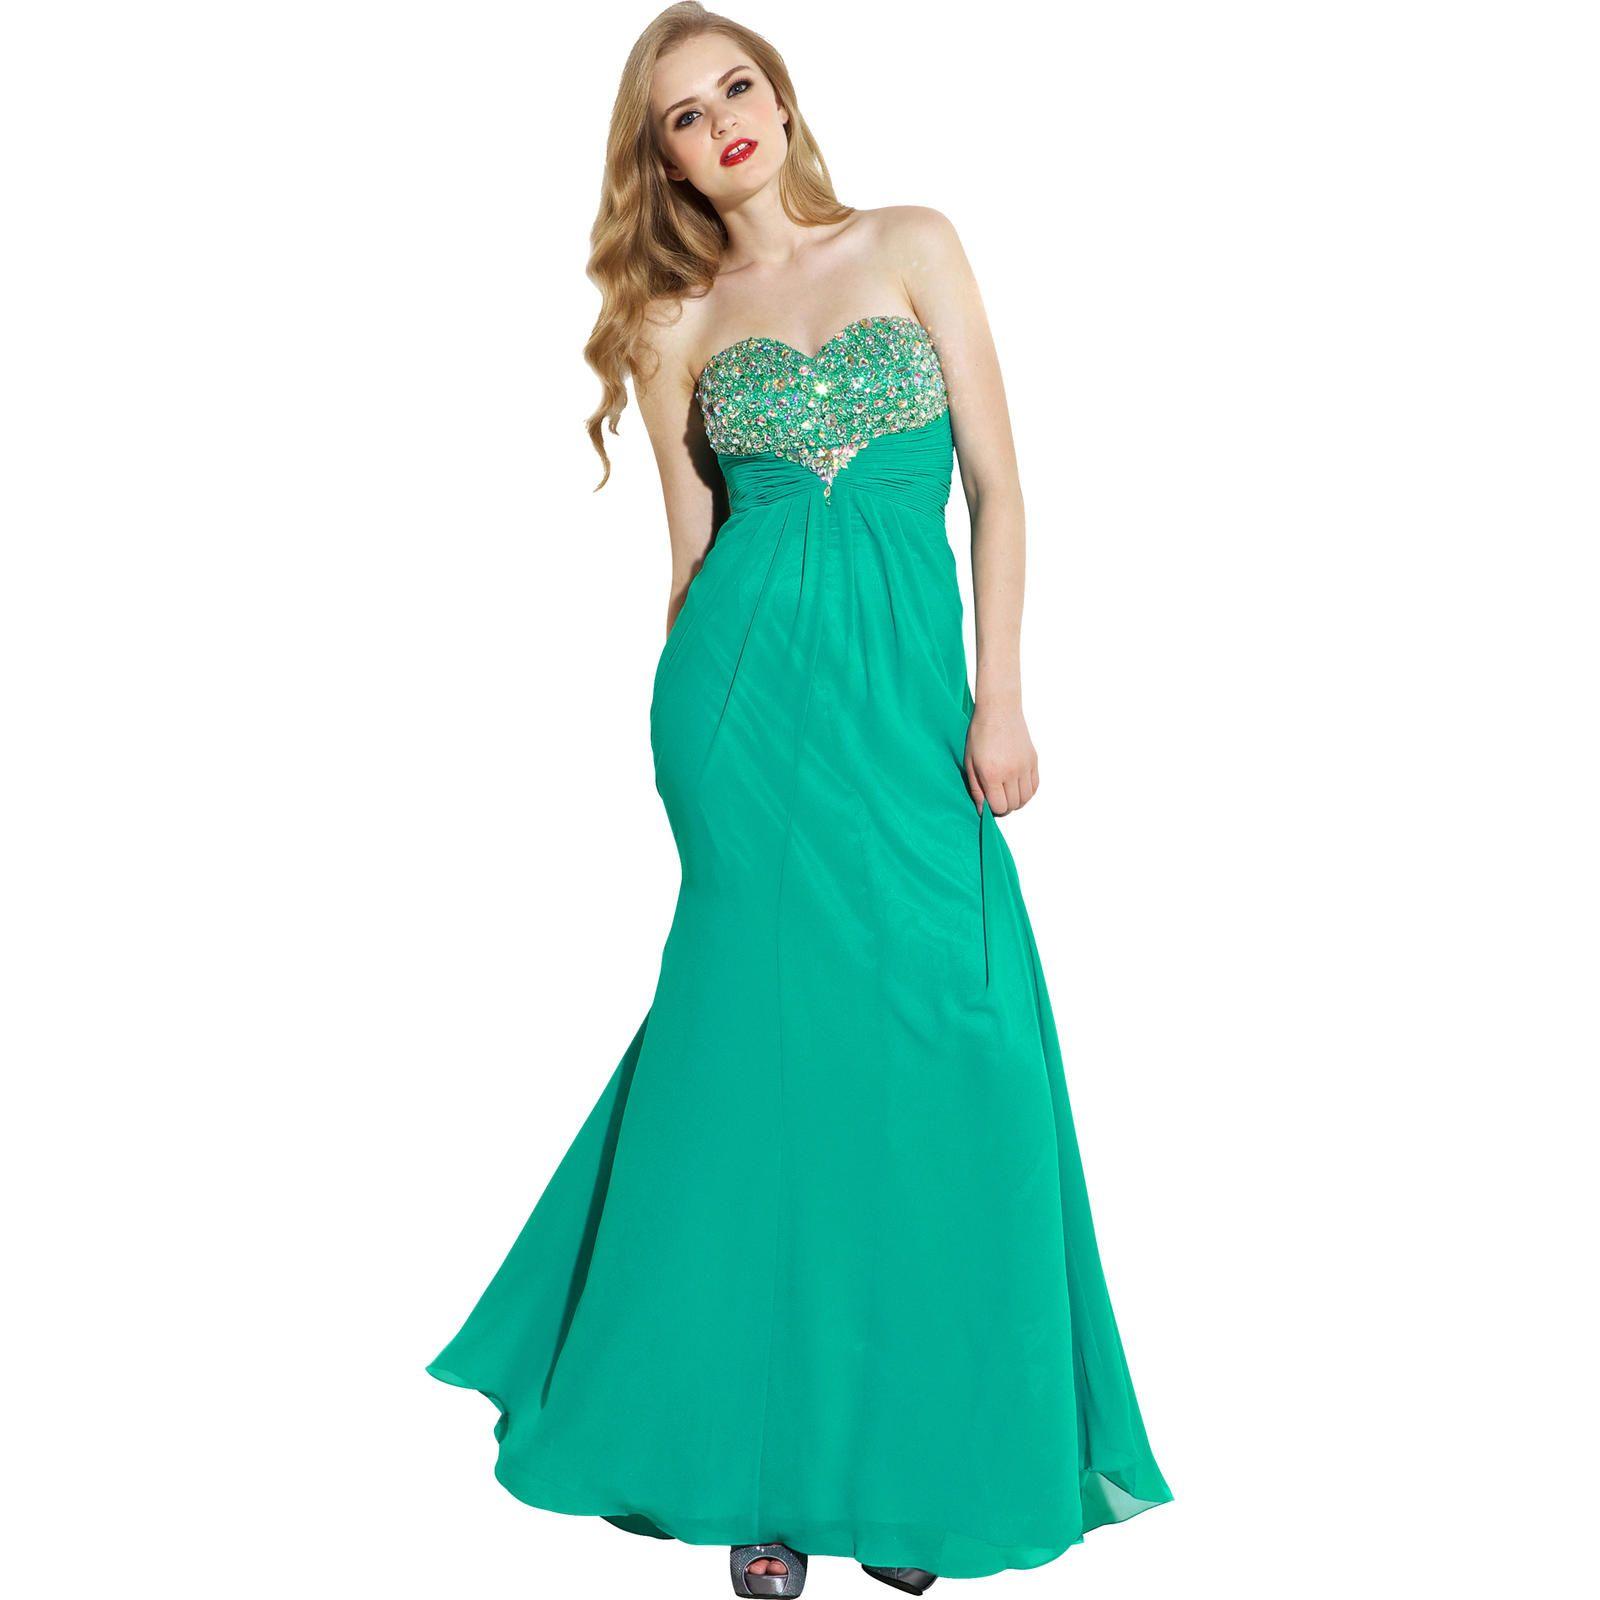 PacificPlex Strapless Beaded Chiffon Formal Gown Goddess Prom Dress ...